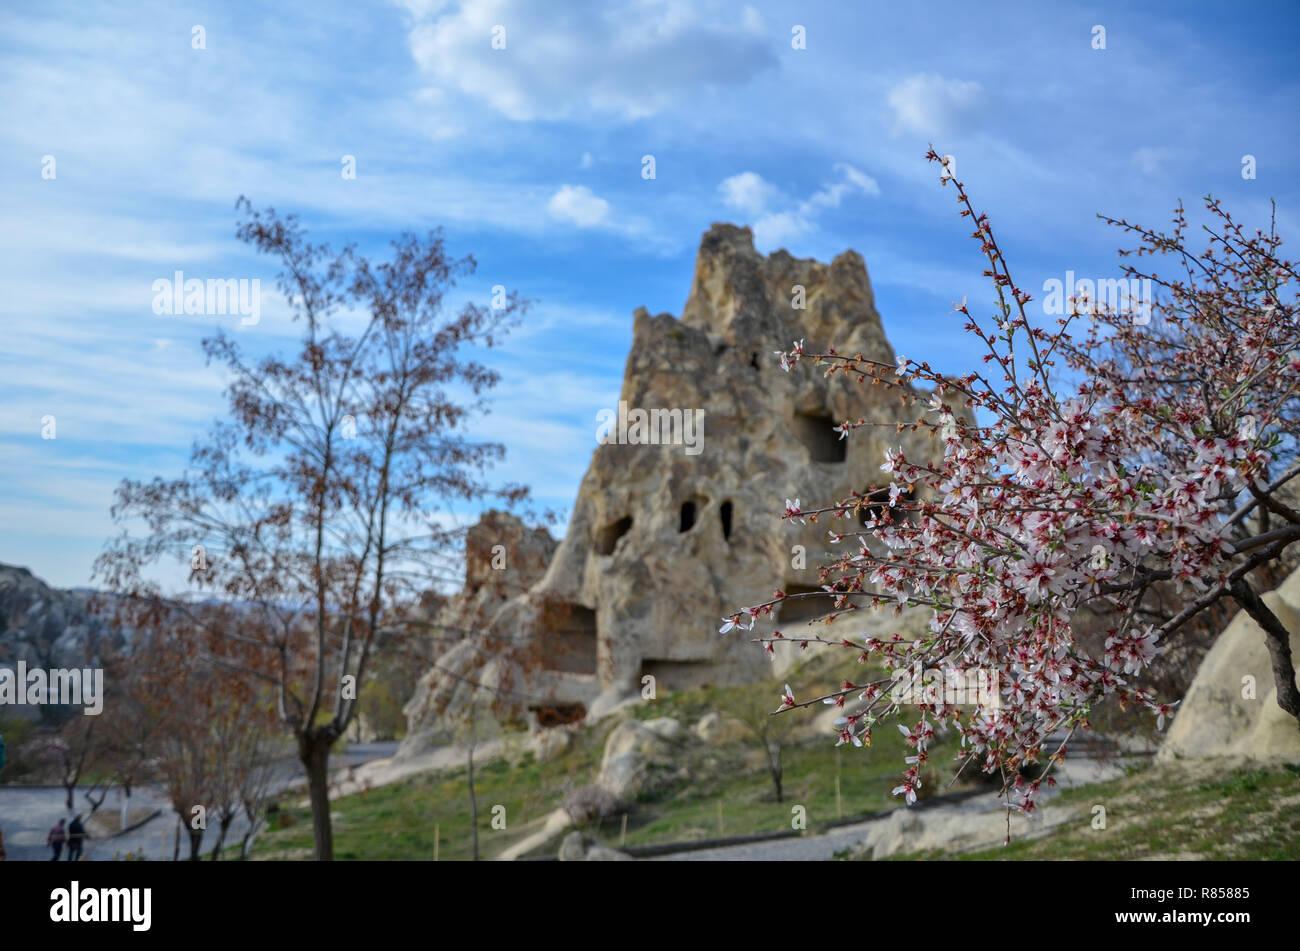 La Cappadoce Cheminees De Fees Au Printemps Istanbul En Turquie